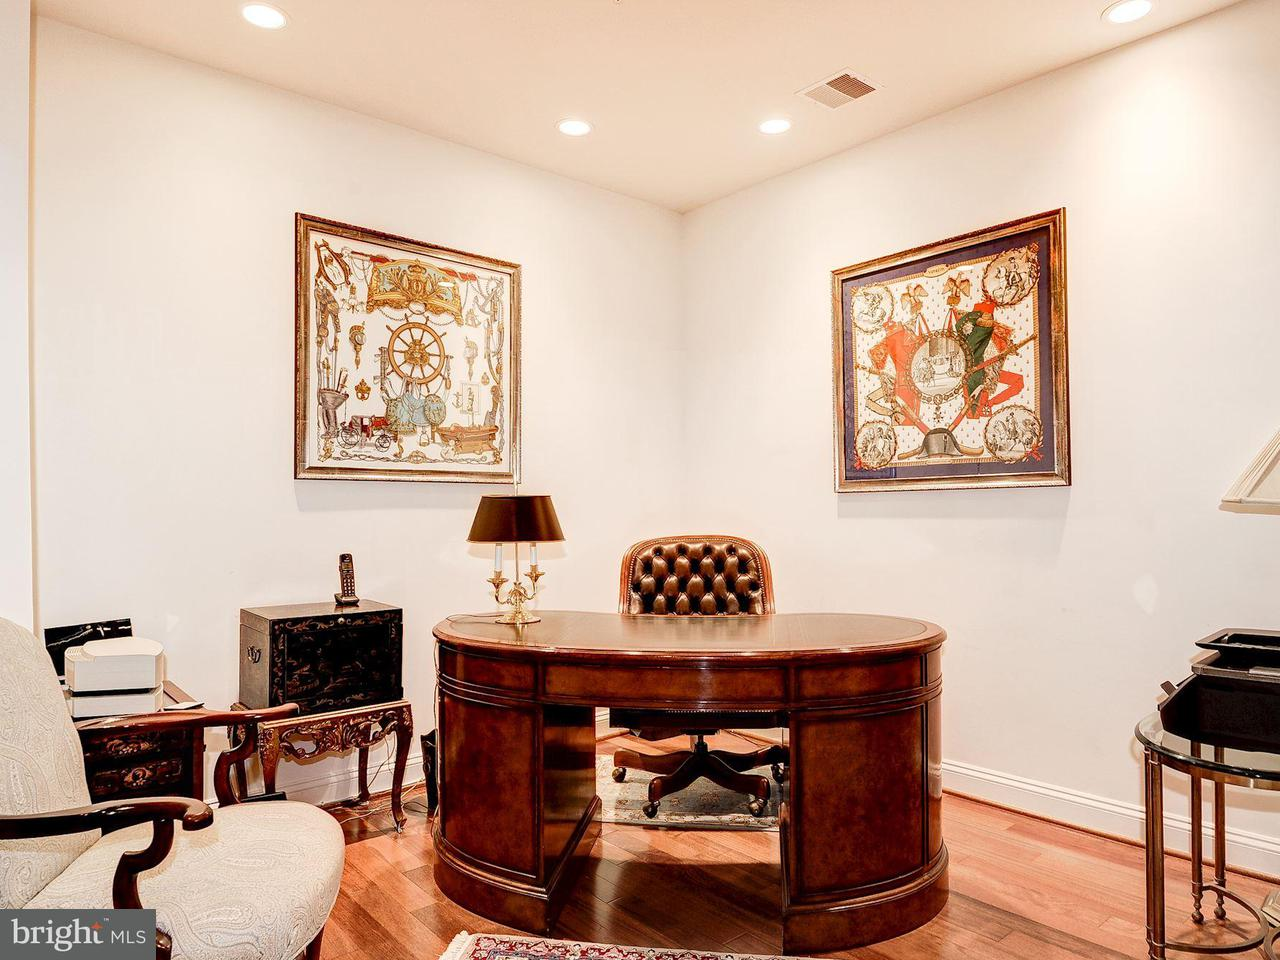 Condominium for Sale at 1781 Chain Bridge Rd #307 1781 Chain Bridge Rd #307 McLean, Virginia 22102 United States